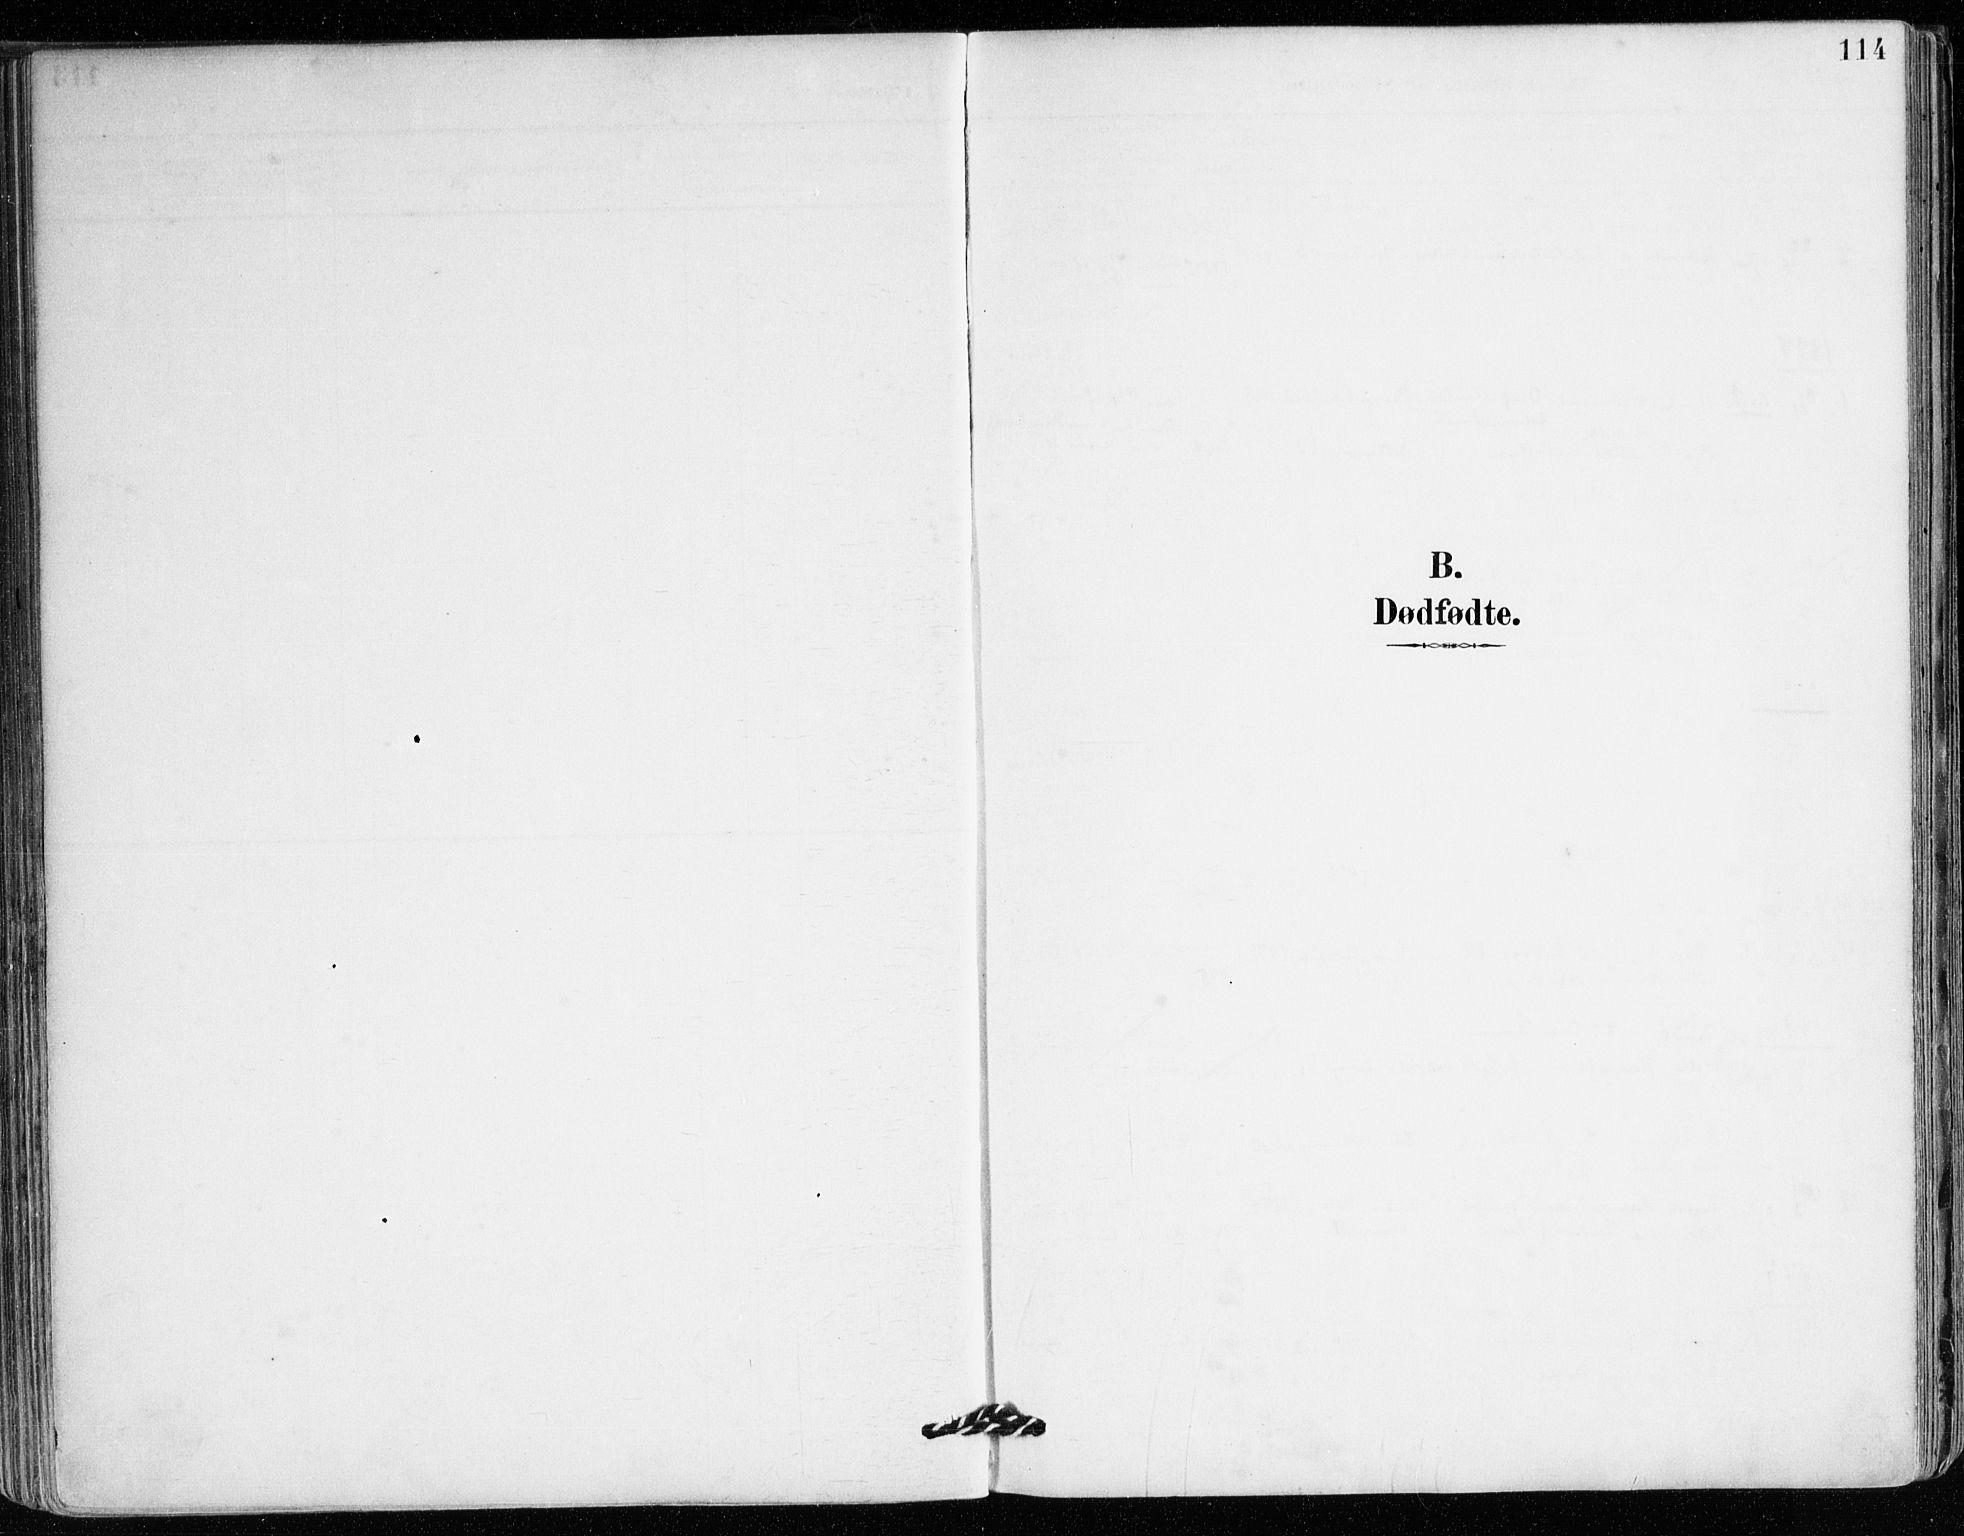 SAB, Mariakirken Sokneprestembete, H/Haa/L0008: Ministerialbok nr. A 8, 1893-1942, s. 114